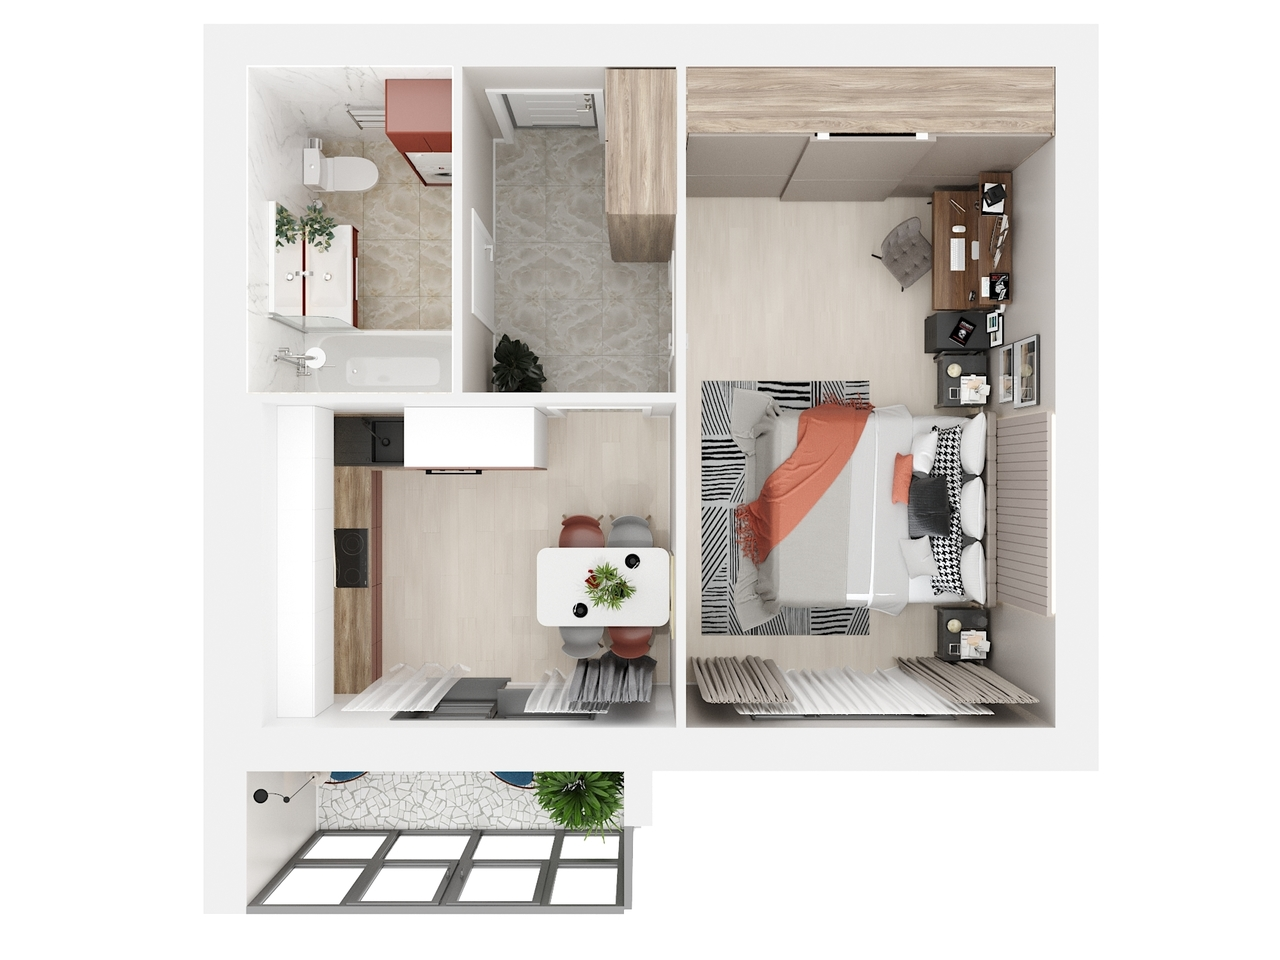 Дом 3 - 1-комнатная №59